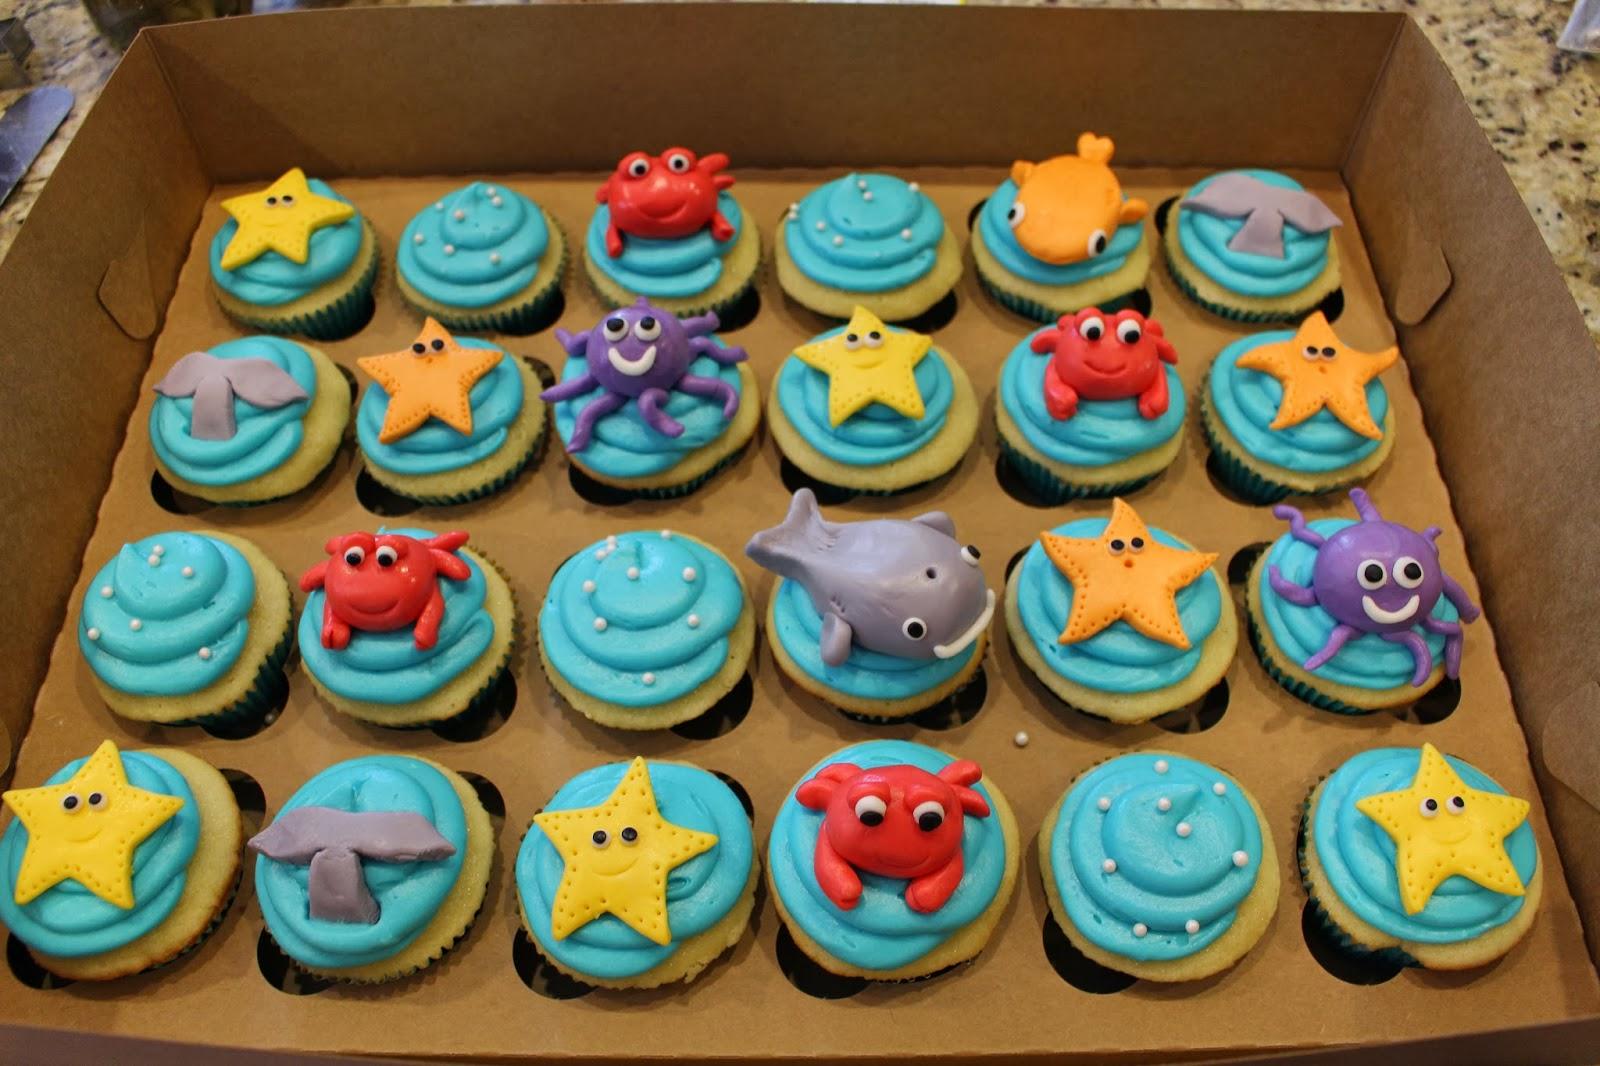 Cupiddycakes Under The Sea Cupcakes For A Friends Ocean Themed